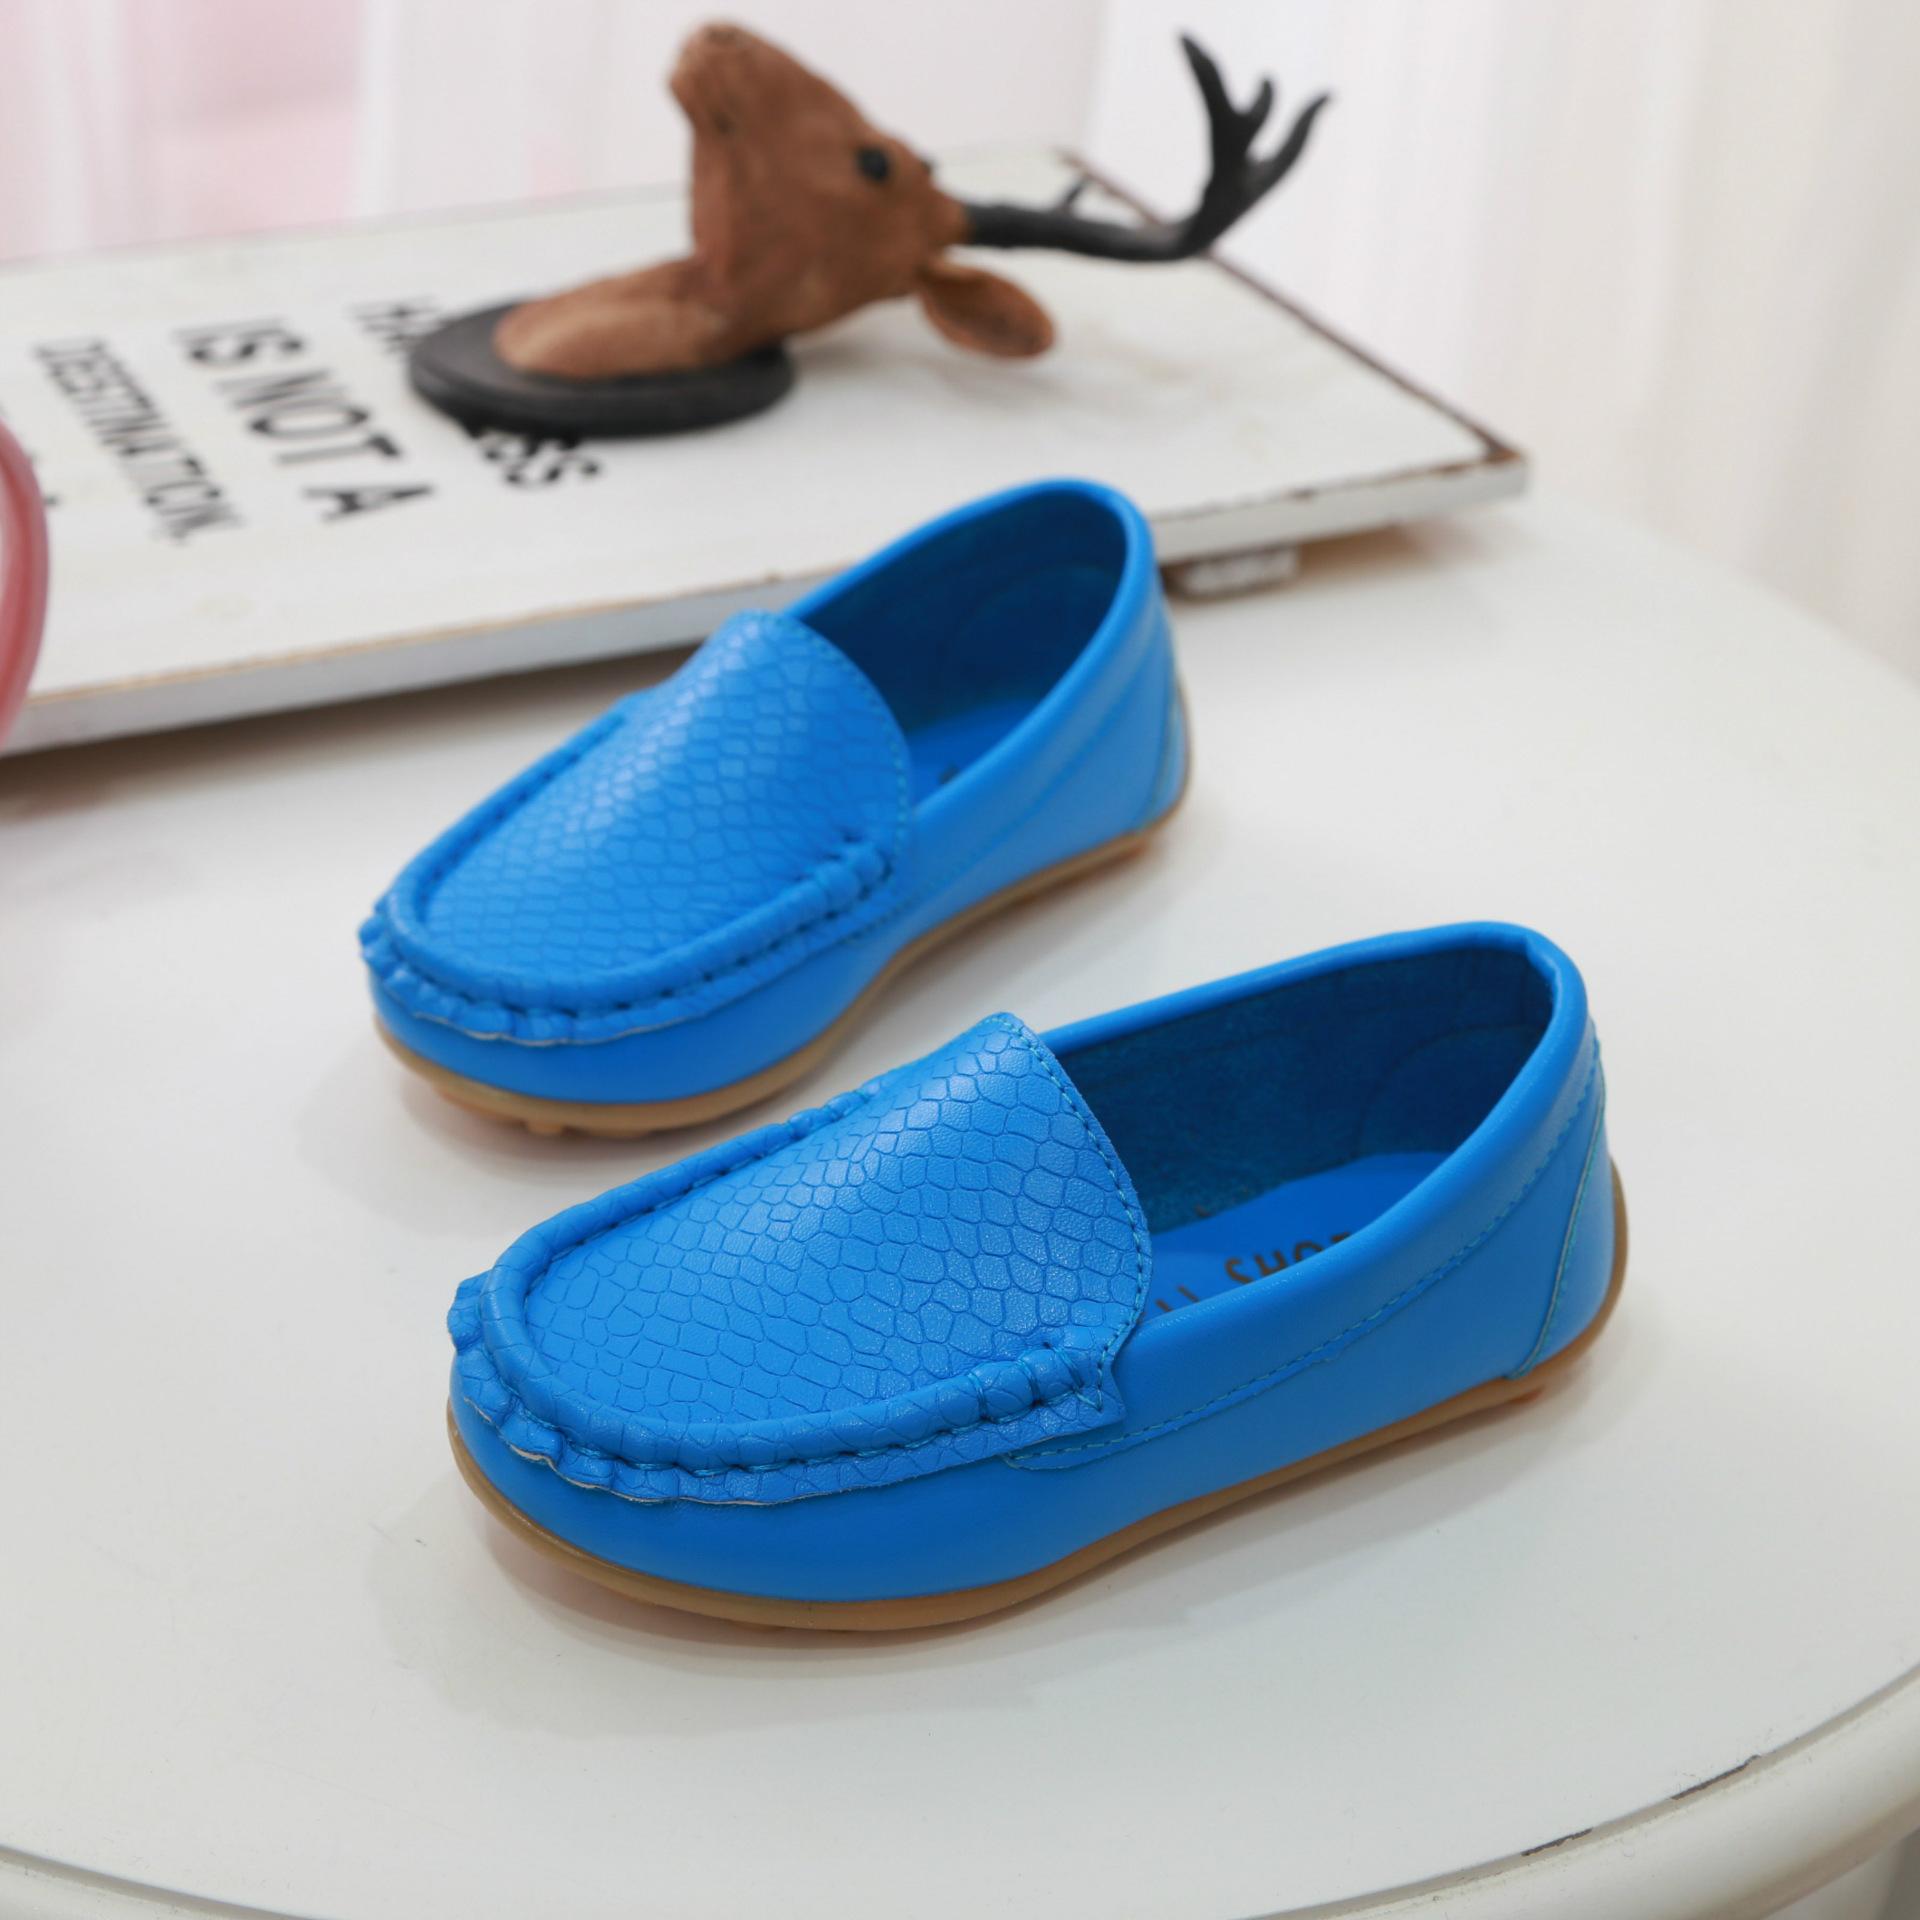 Kids Girls Shoes Peas Soft Bottoms Moccasins Tide Children's Comfortable Flats